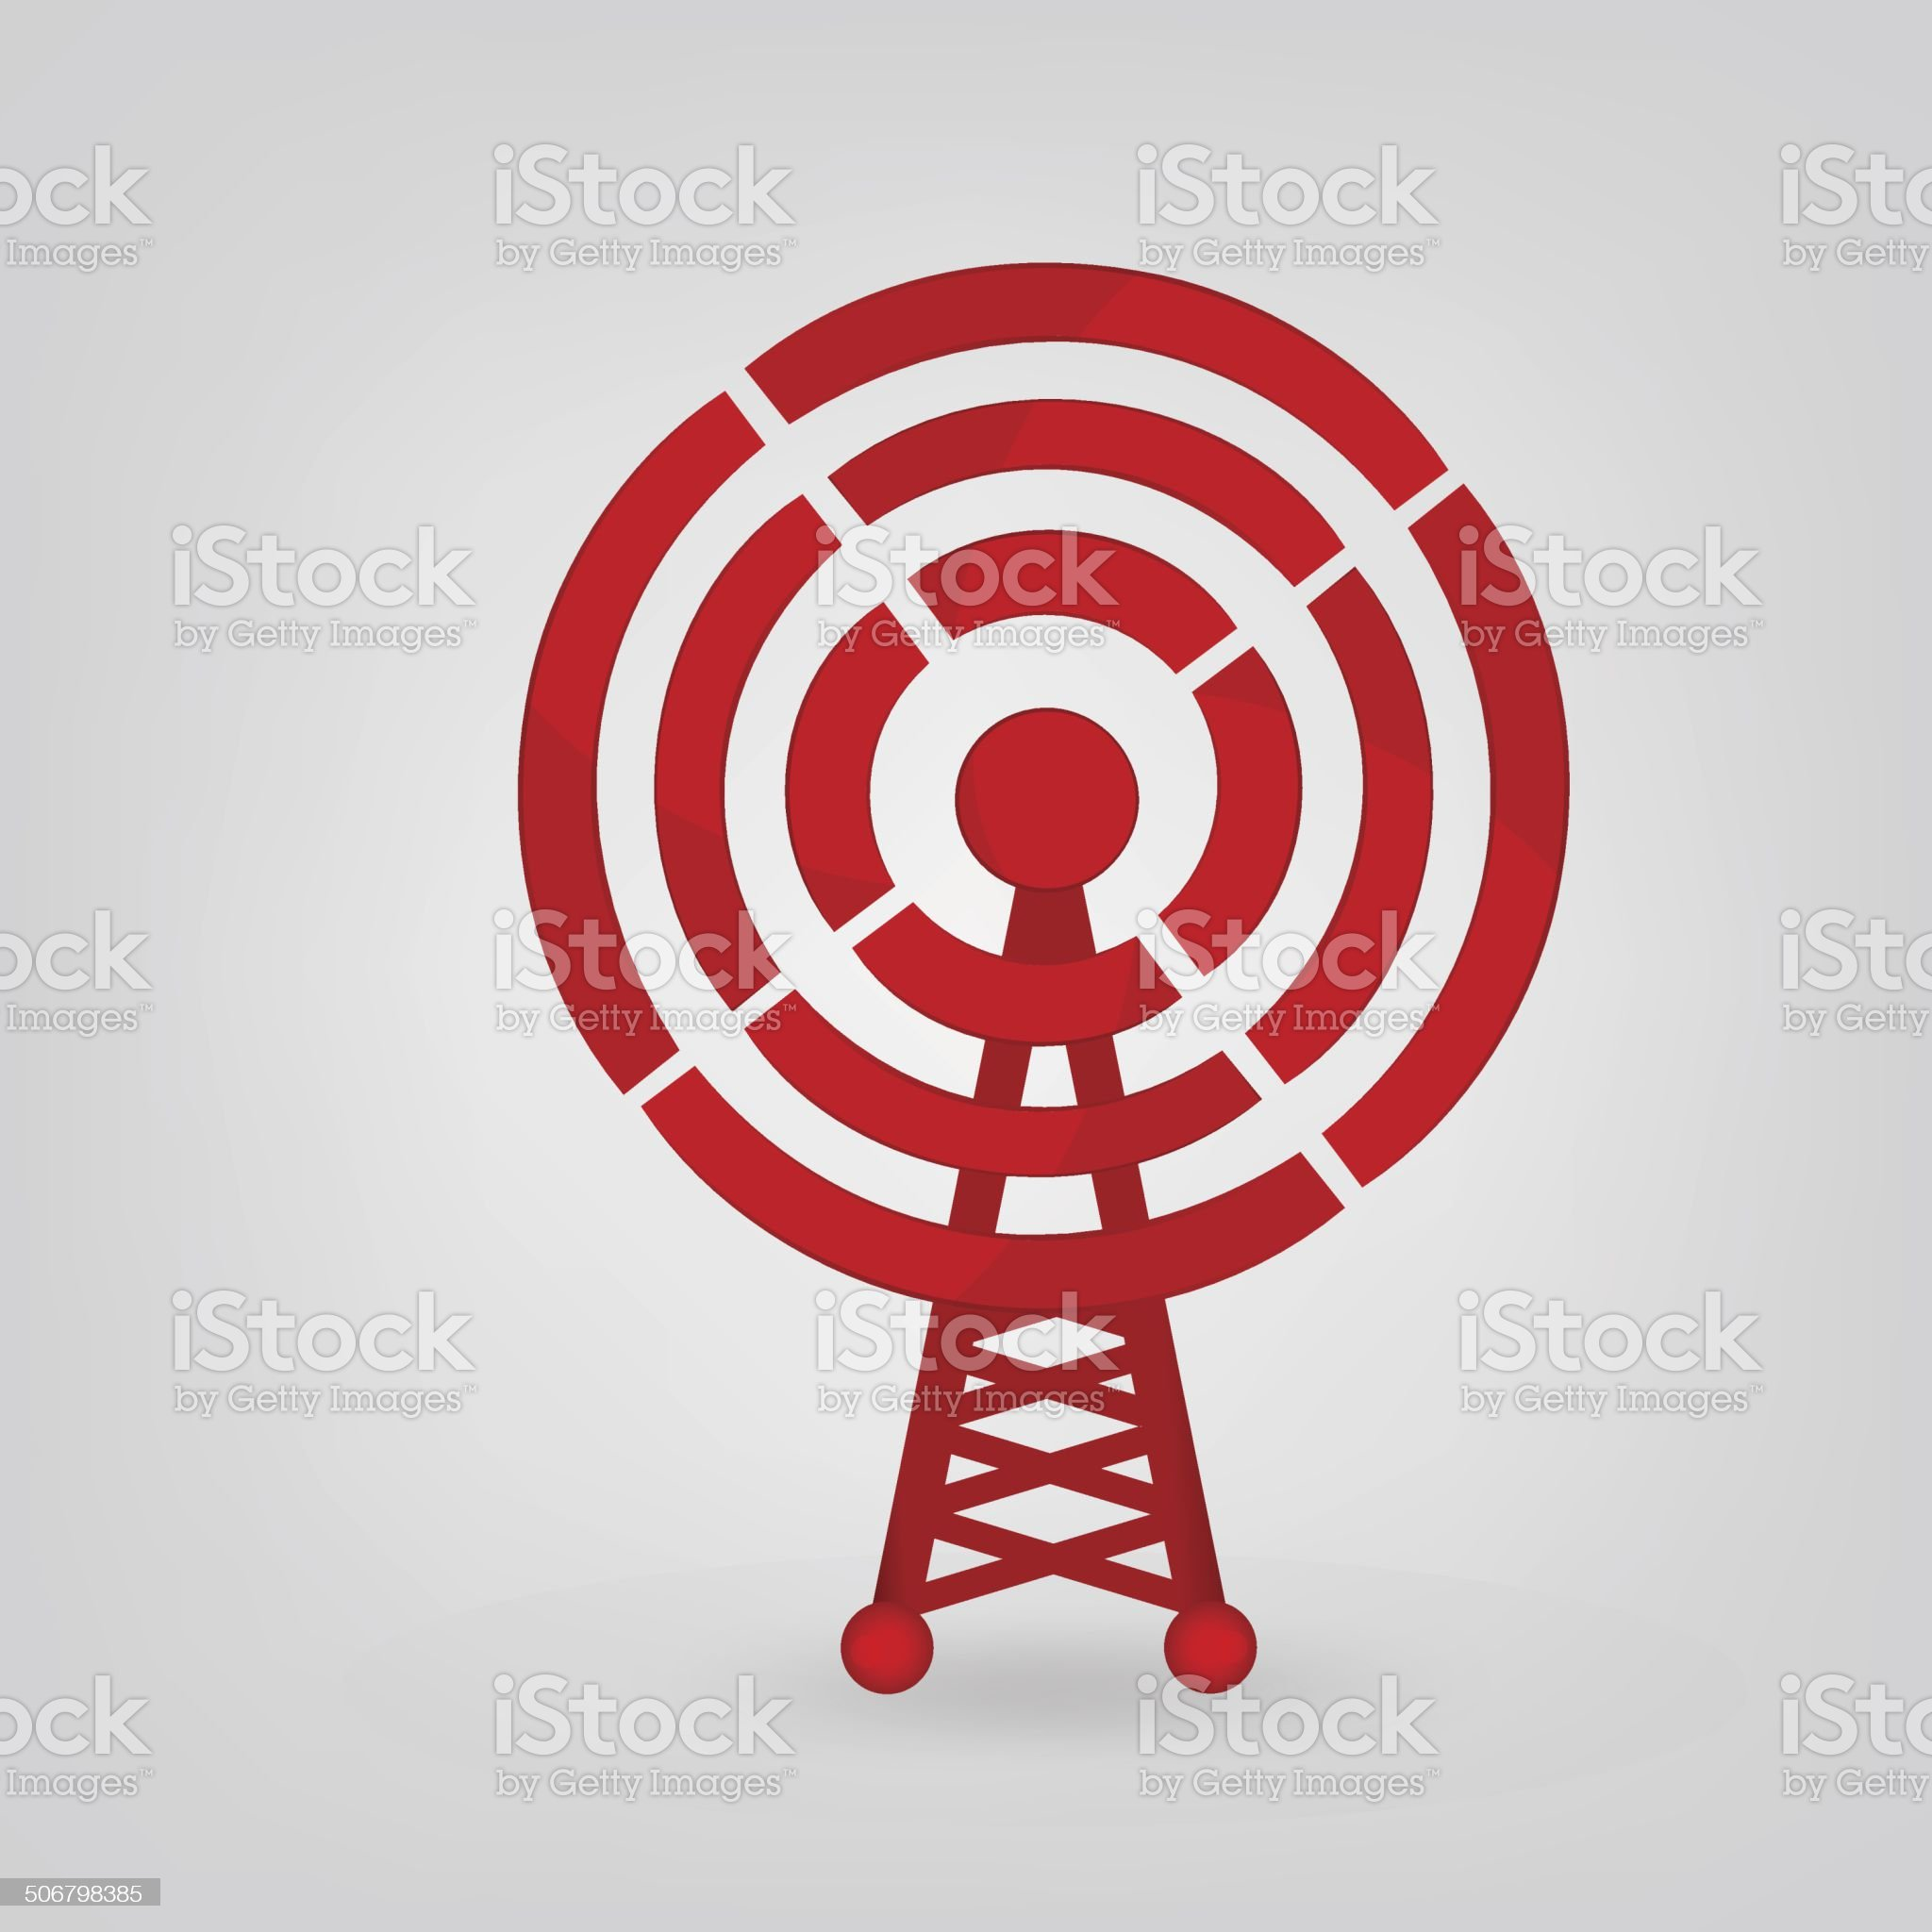 radio tower icon royalty-free stock vector art